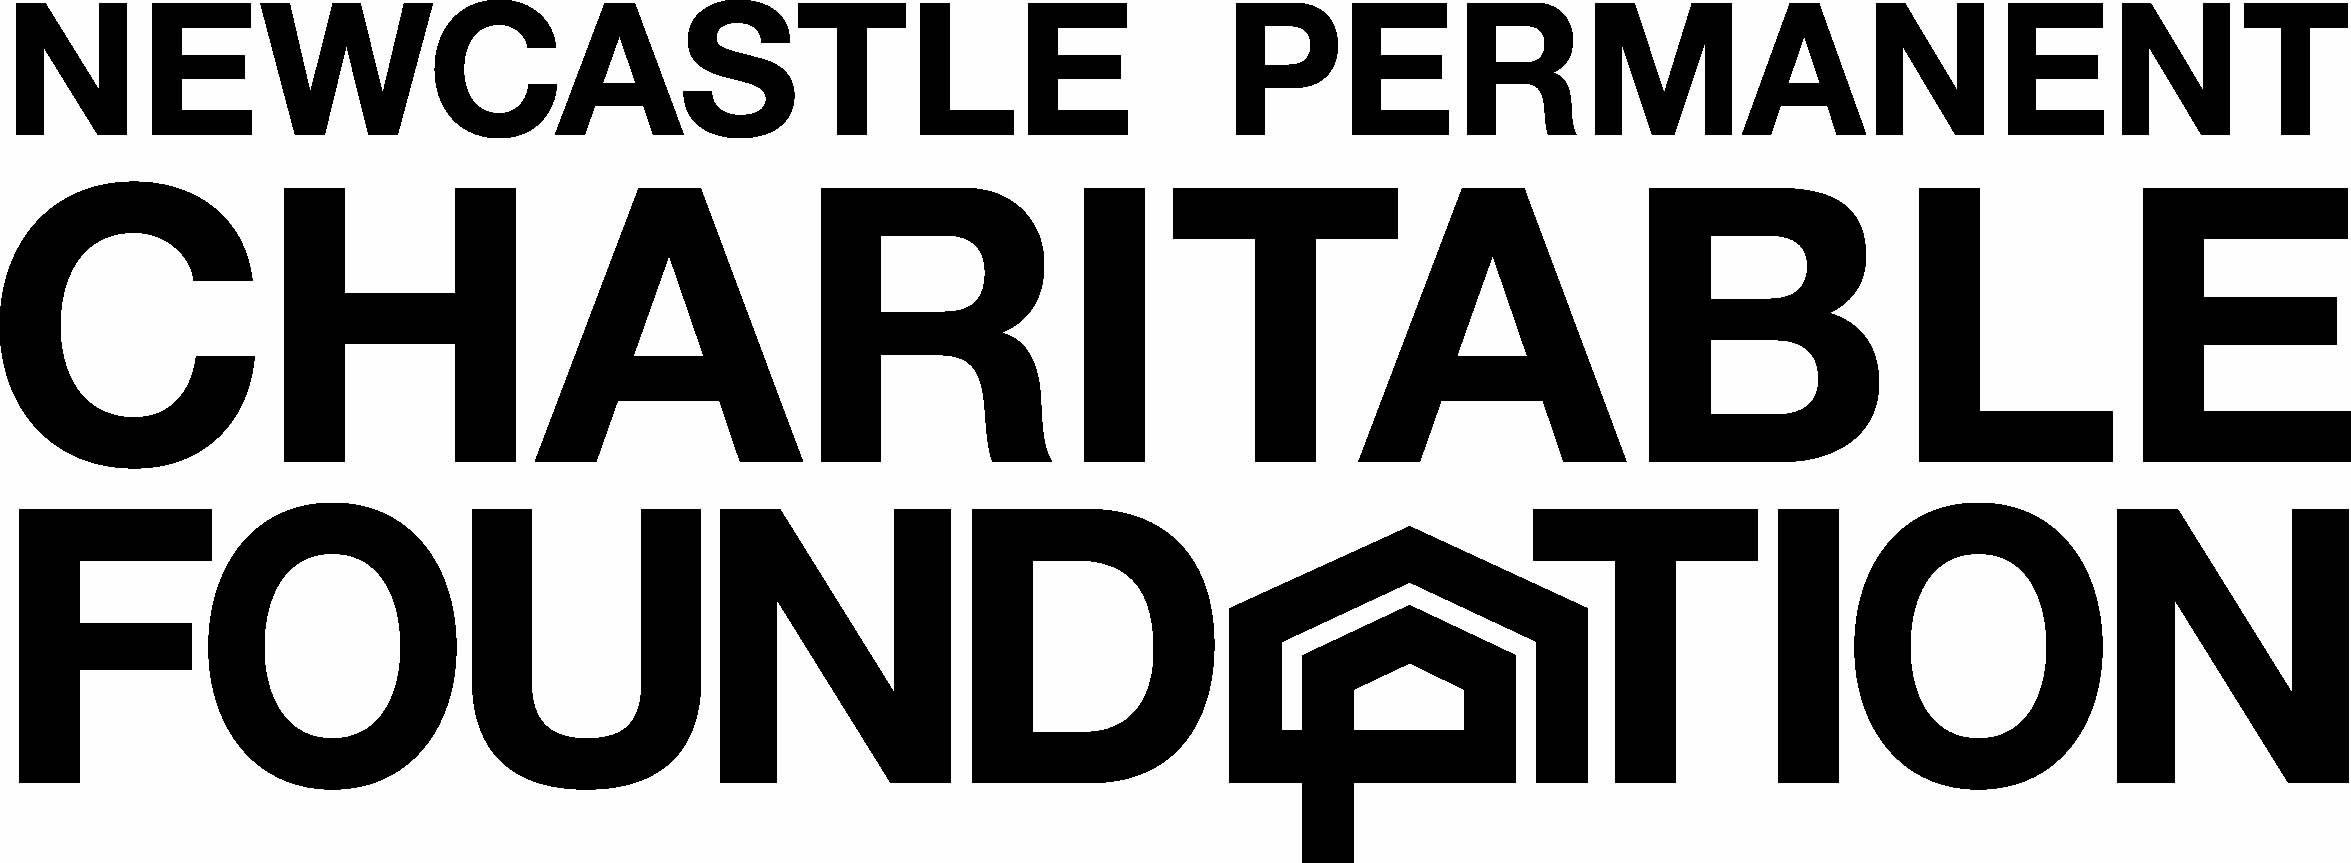 newcastle-permanent-charitable-foundation-logo